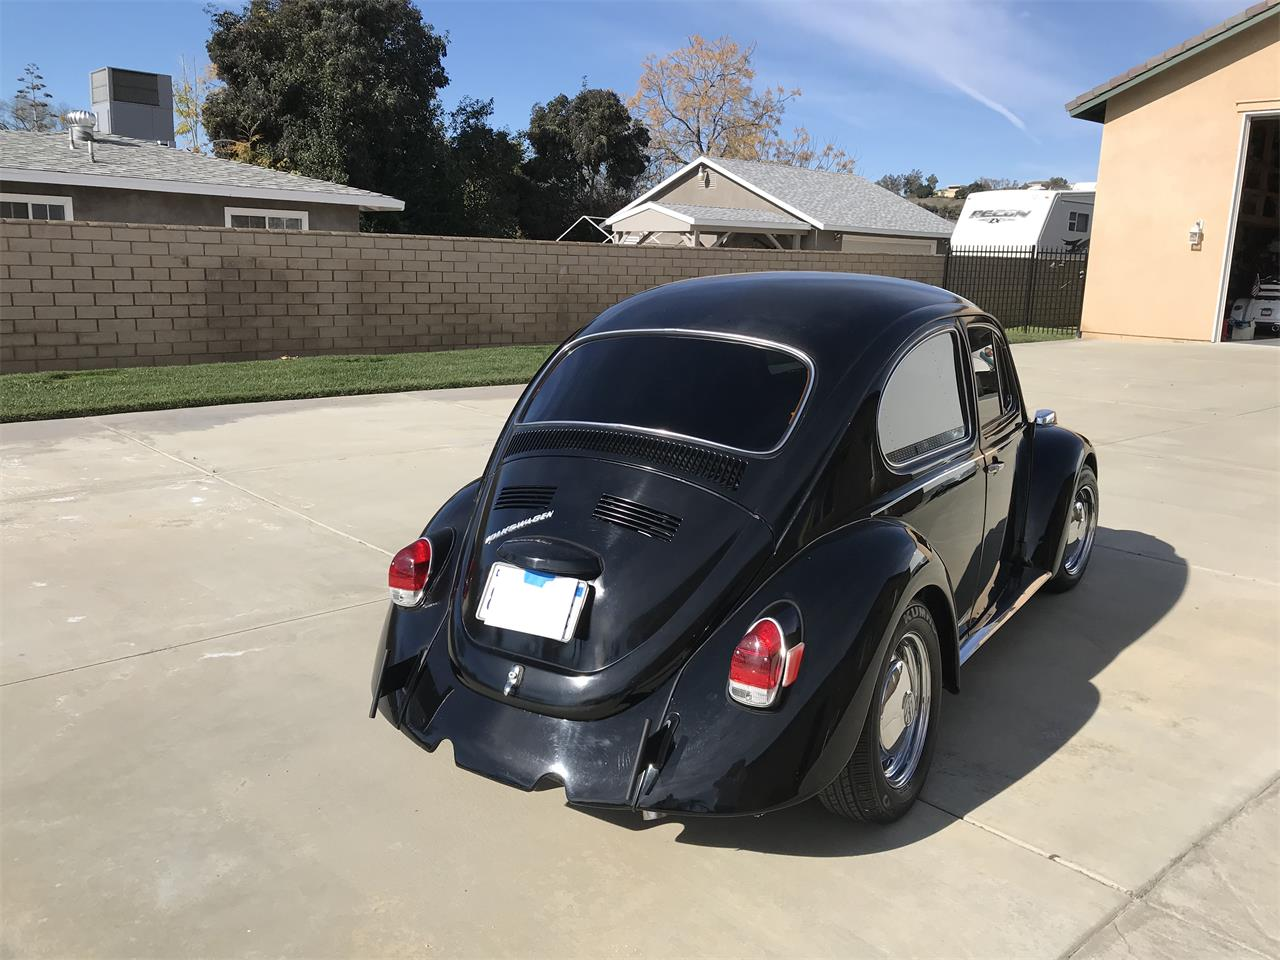 1970 Volkswagen Beetle (CC-1310179) for sale in Yucaipa, California